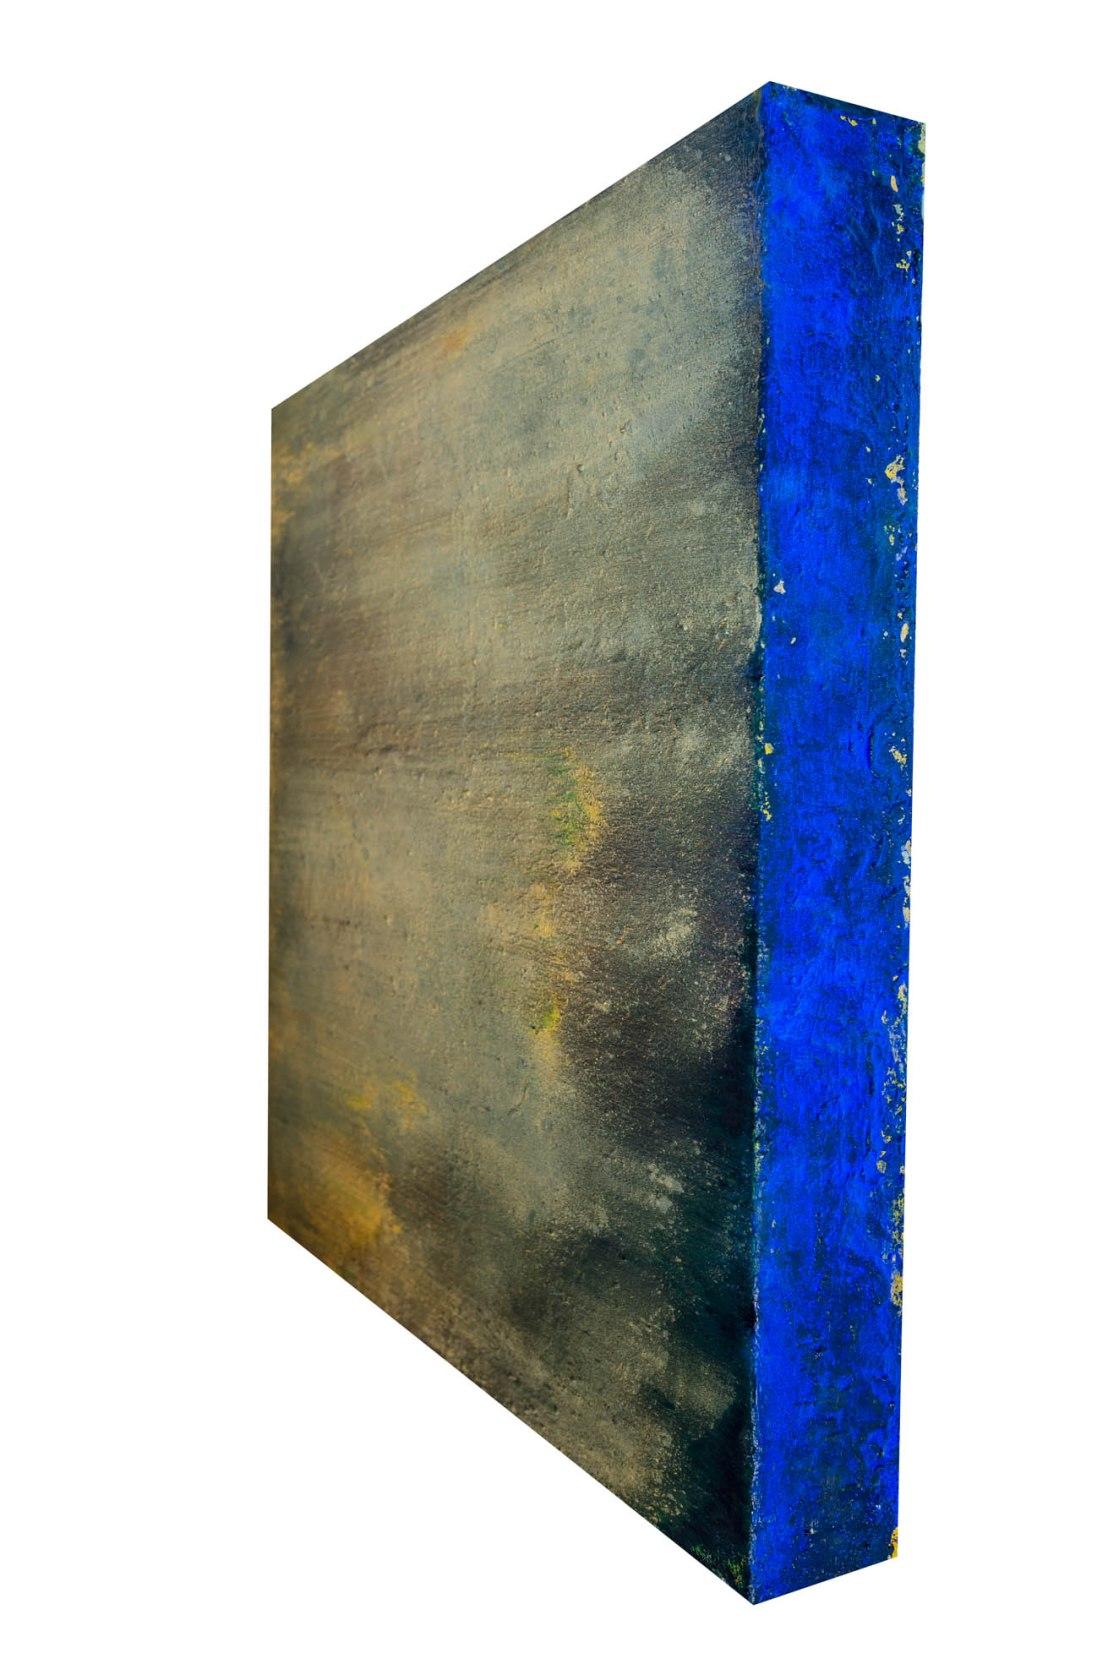 Alberto Reguera 2017 100 x 100x 13 cm jpg (2)